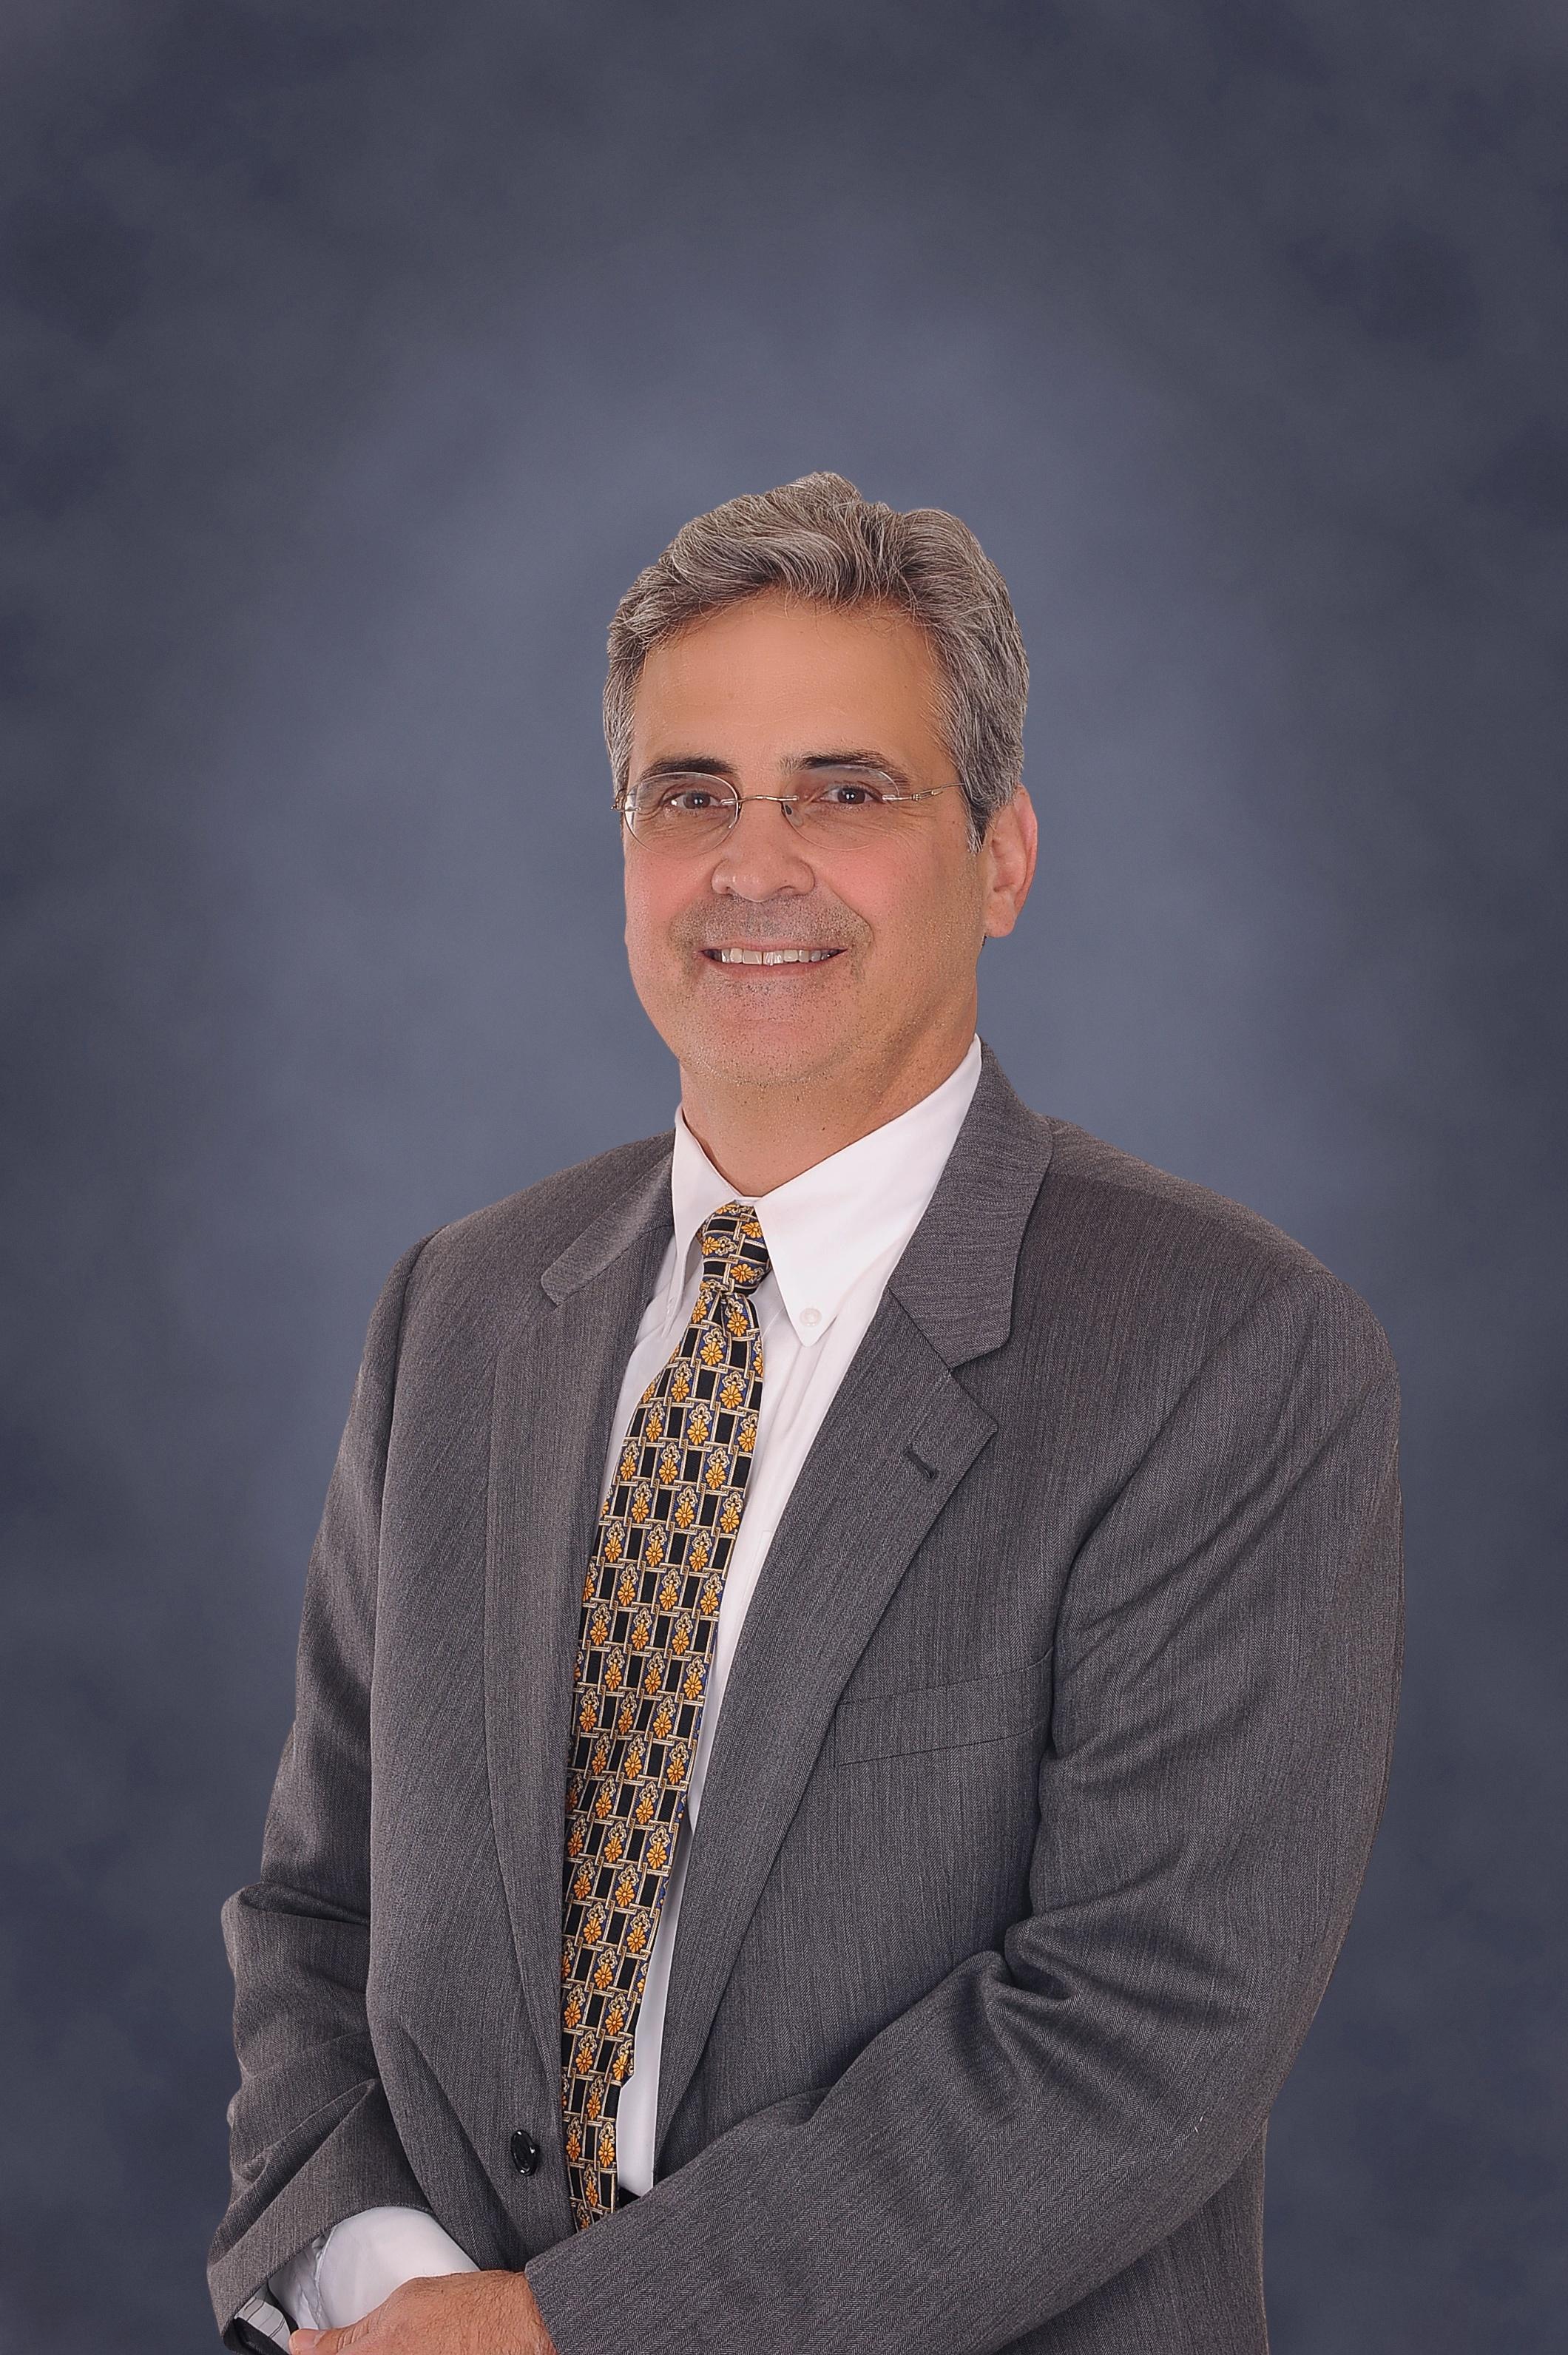 Dr. Antonio Ruiz